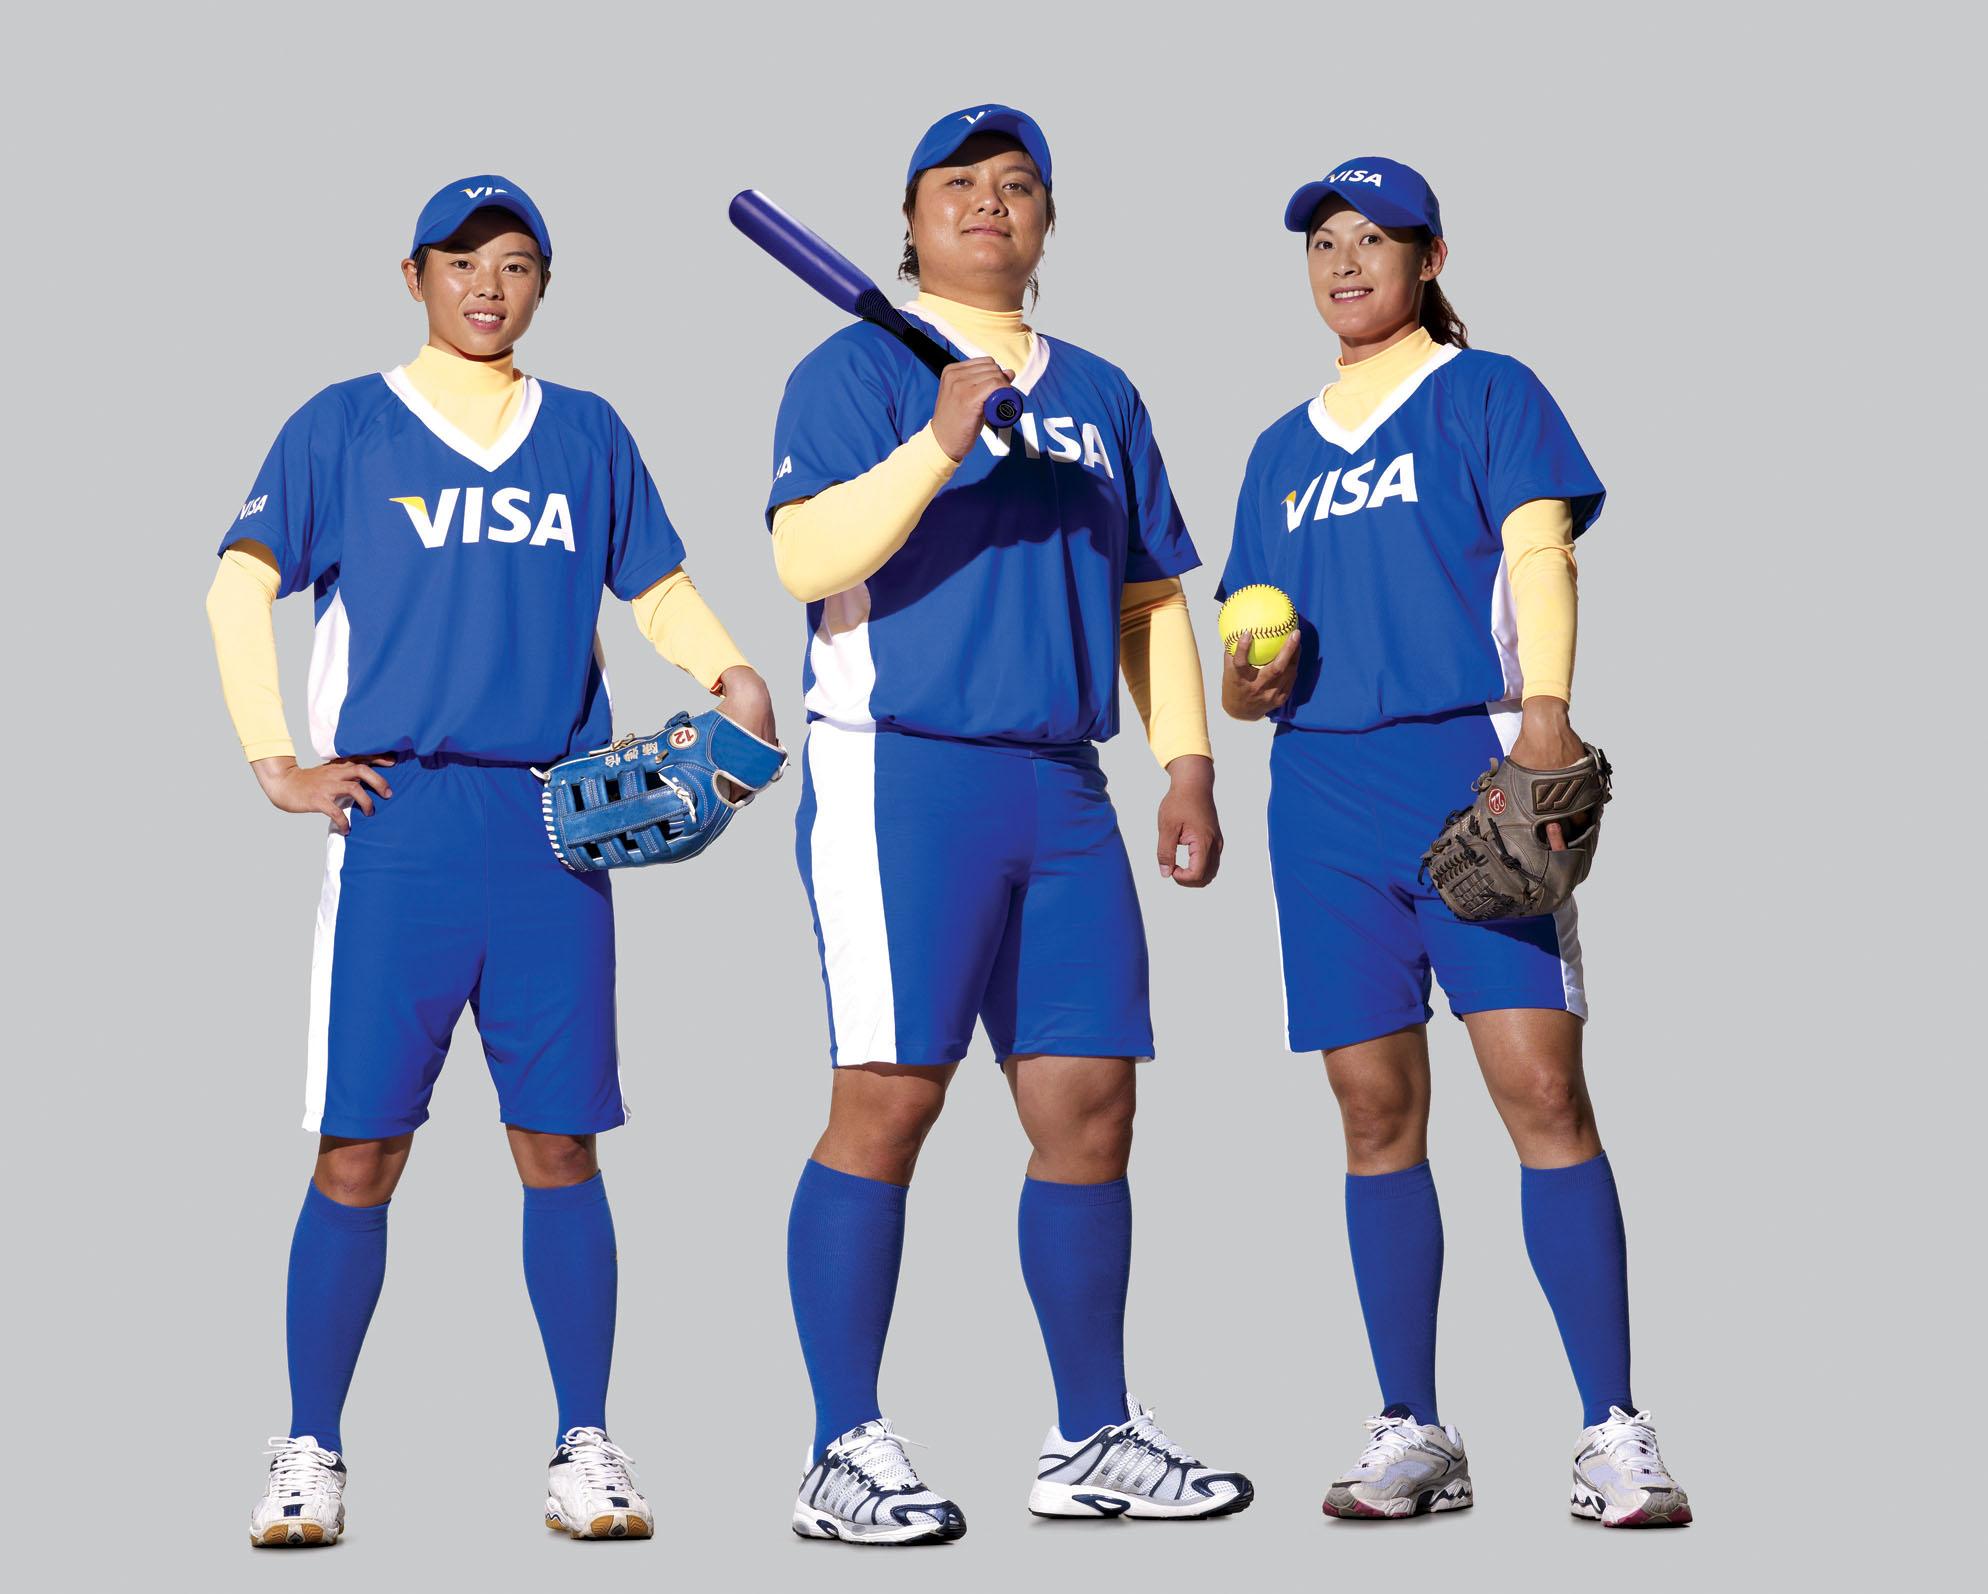 Visa支持奧運選手正式成立「Team Visa」,集合體育菁英,攜手在2008年奧林匹克運動會全力奪牌。圖為「Team Visa」女壘隊...